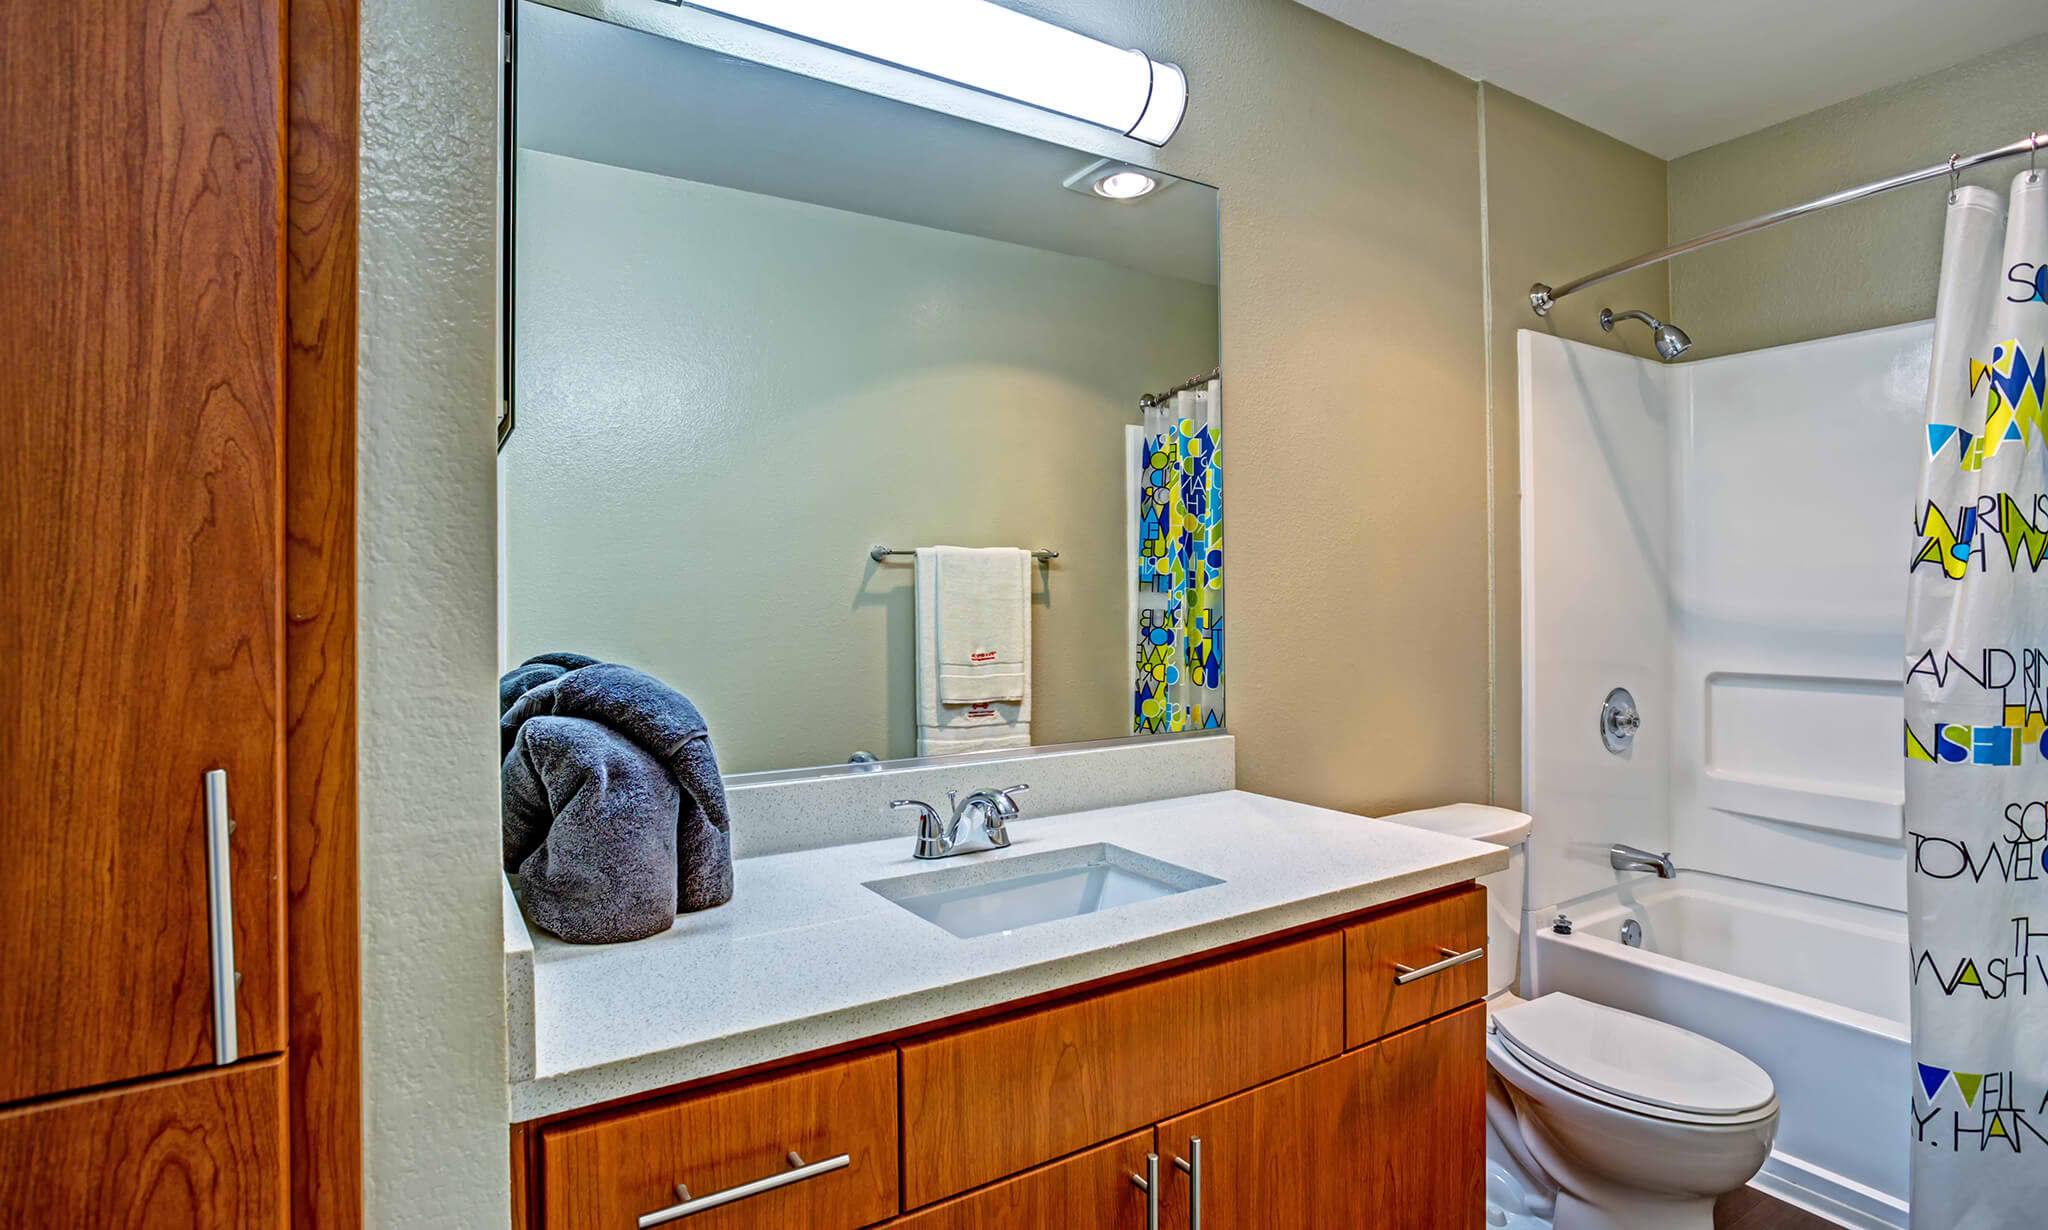 Alderwood Apartments apartments in Santa Clara CA to rent photo 13